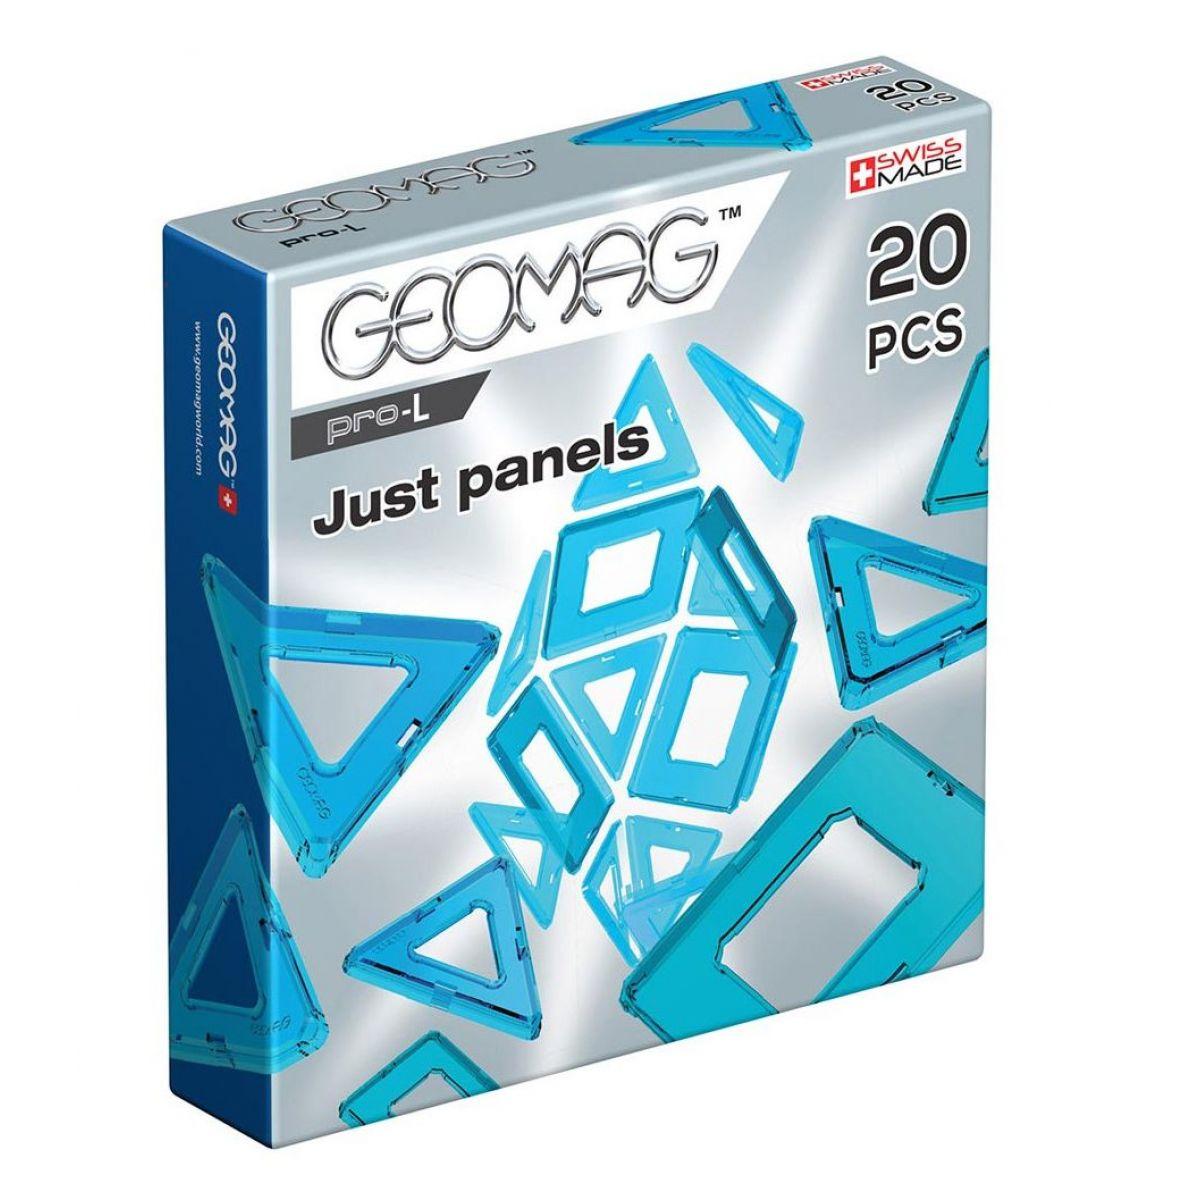 Geomag Pro-L Panels